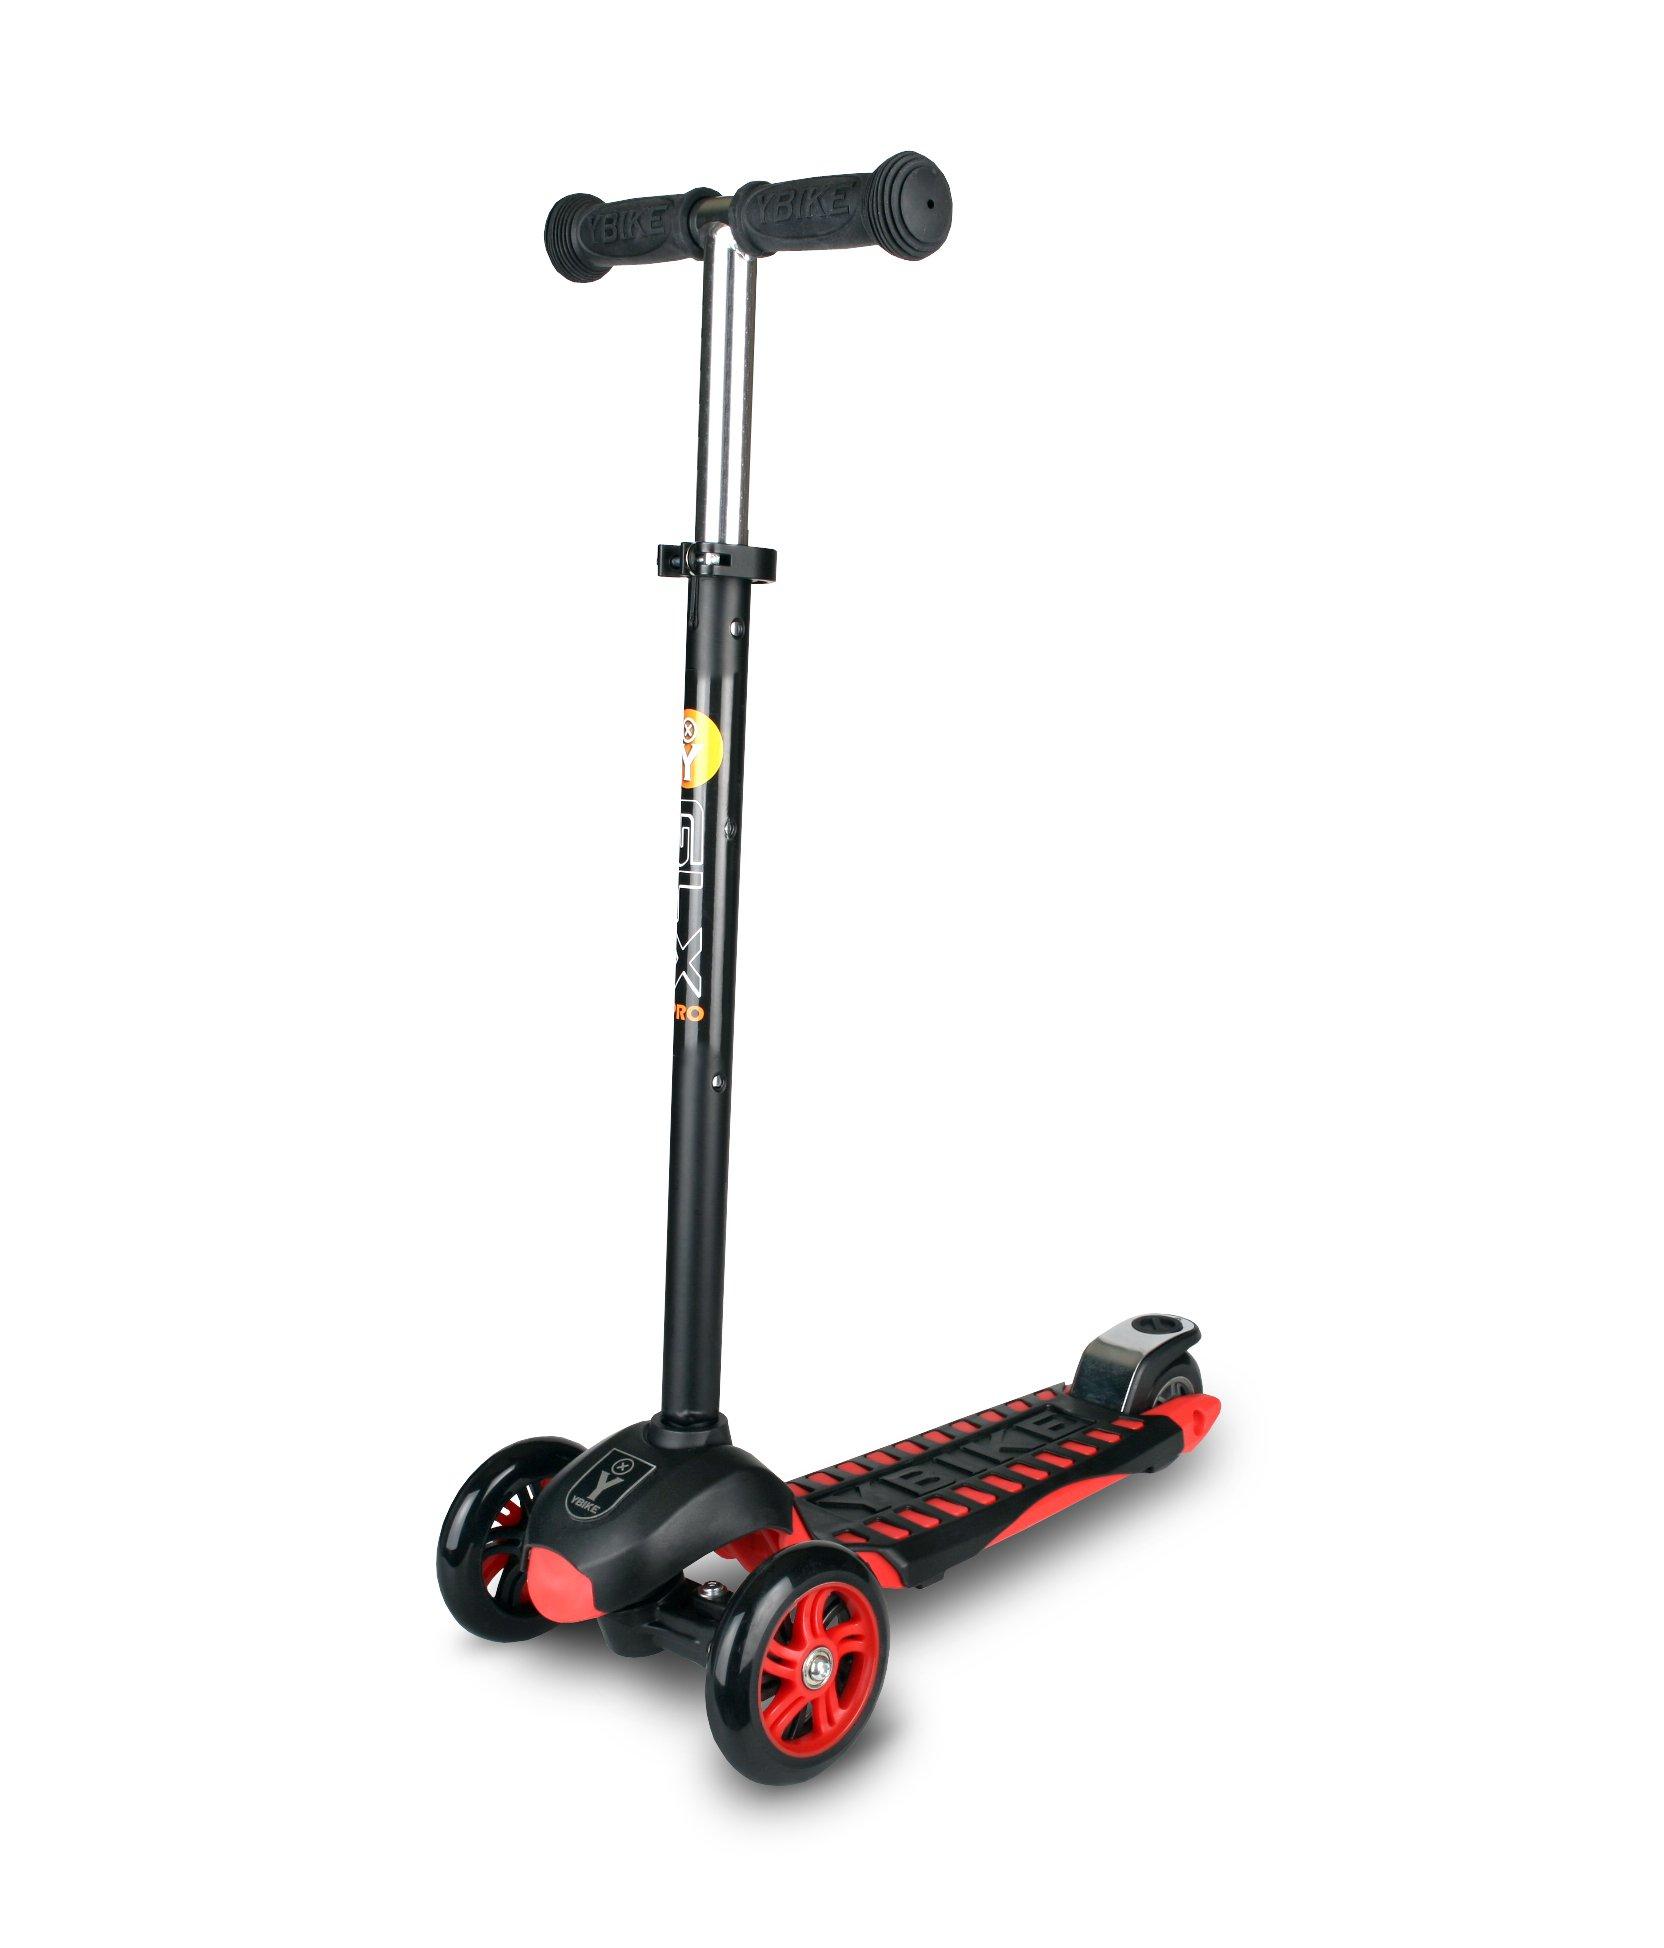 YBIKE GLX Pro Scooter, Black/Red, 12cm by YBIKE